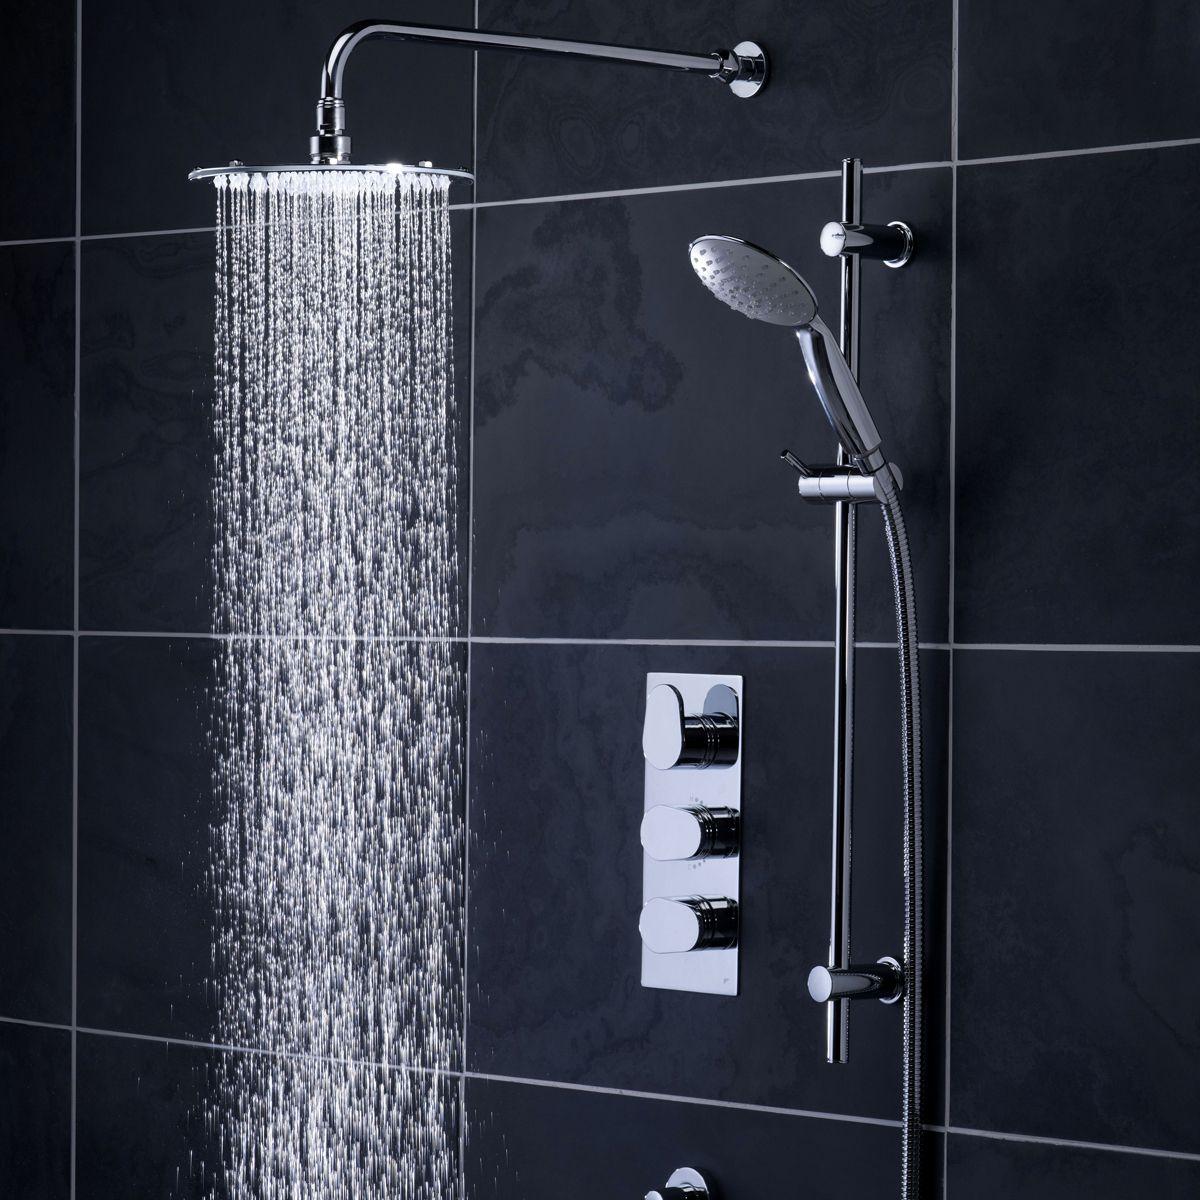 Concealed Shower Room Steam Room Thermostatic Valve: Roper Rhodes Stream Concealed Thermostatic Shower Valve